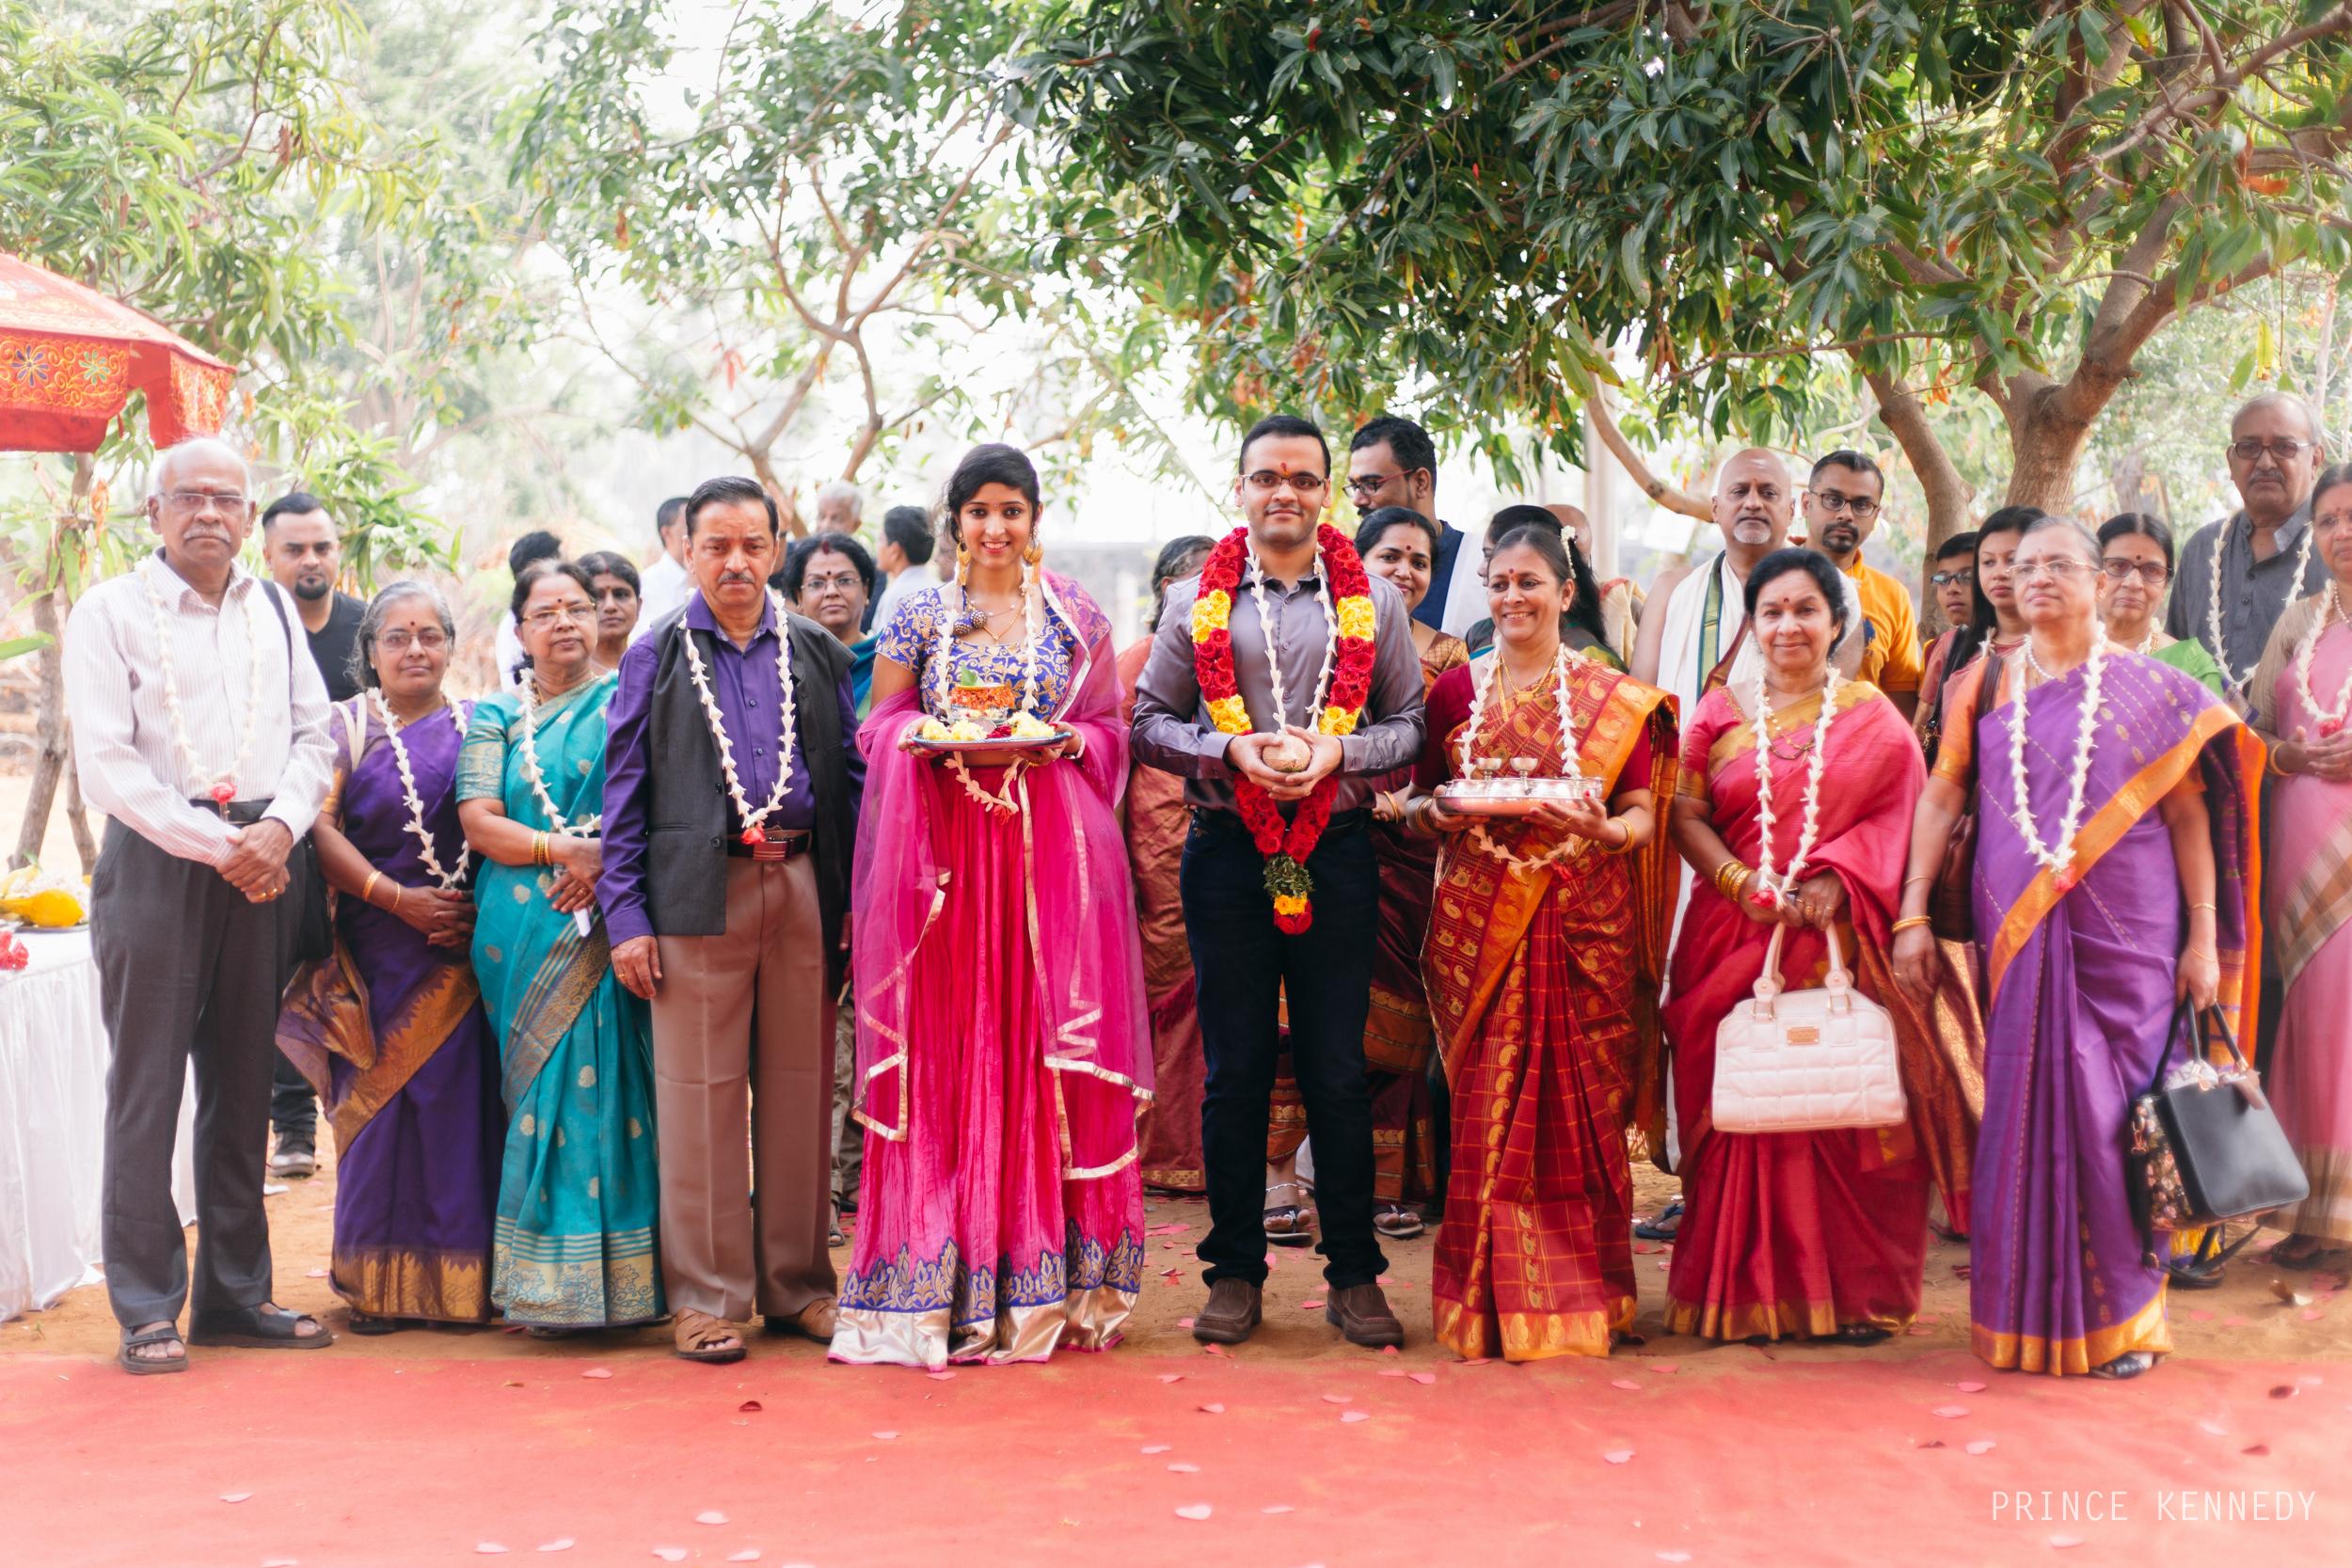 Athmajja-Nithesh-Engagement-Couple-Portrait-Portraiture-Wedding-Couple-Portrait-Chennai-Photographer-Candid-Photography-Destination-Best-Prince-Kennedy-Photography-105.jpg